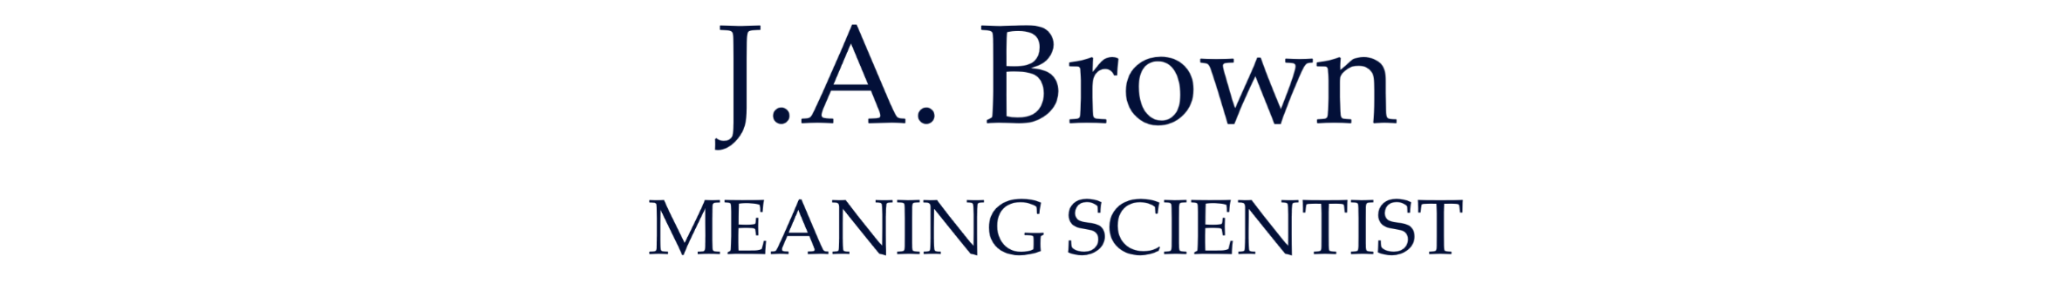 The J.A.Brown logo.